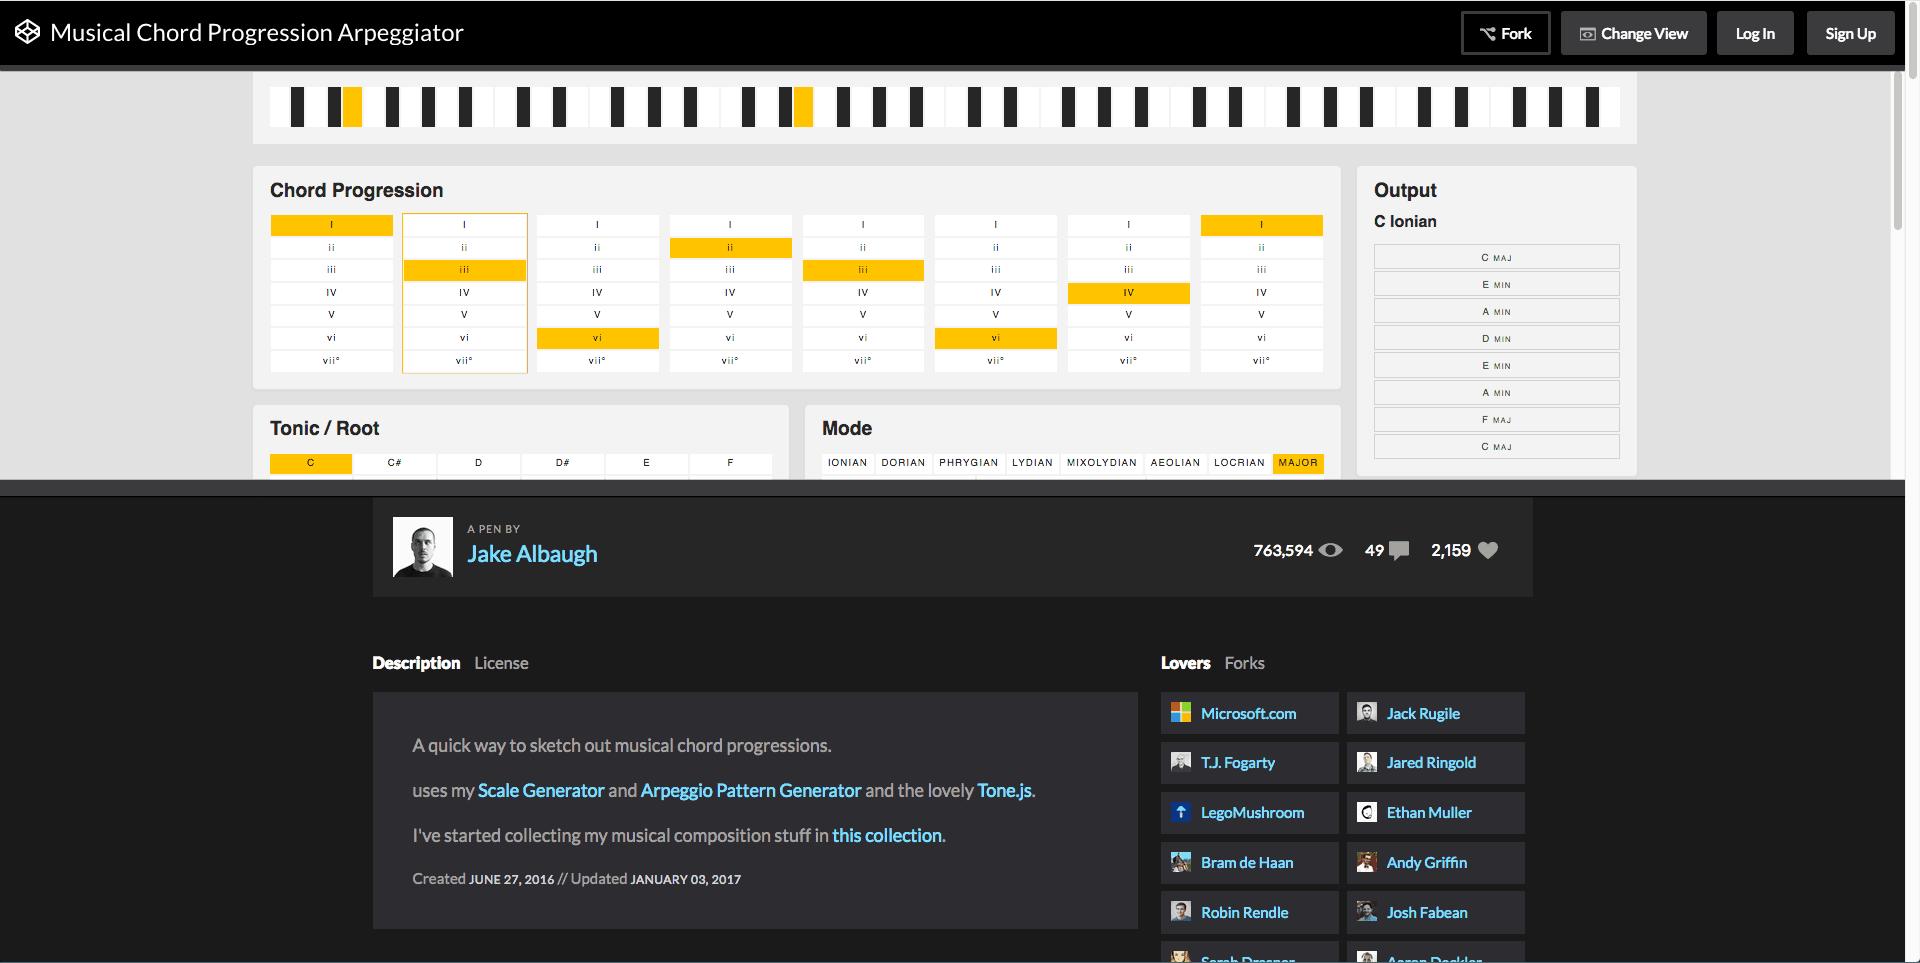 Groß Programm Online Skizzieren Ideen - Schaltplan Serie Circuit ...